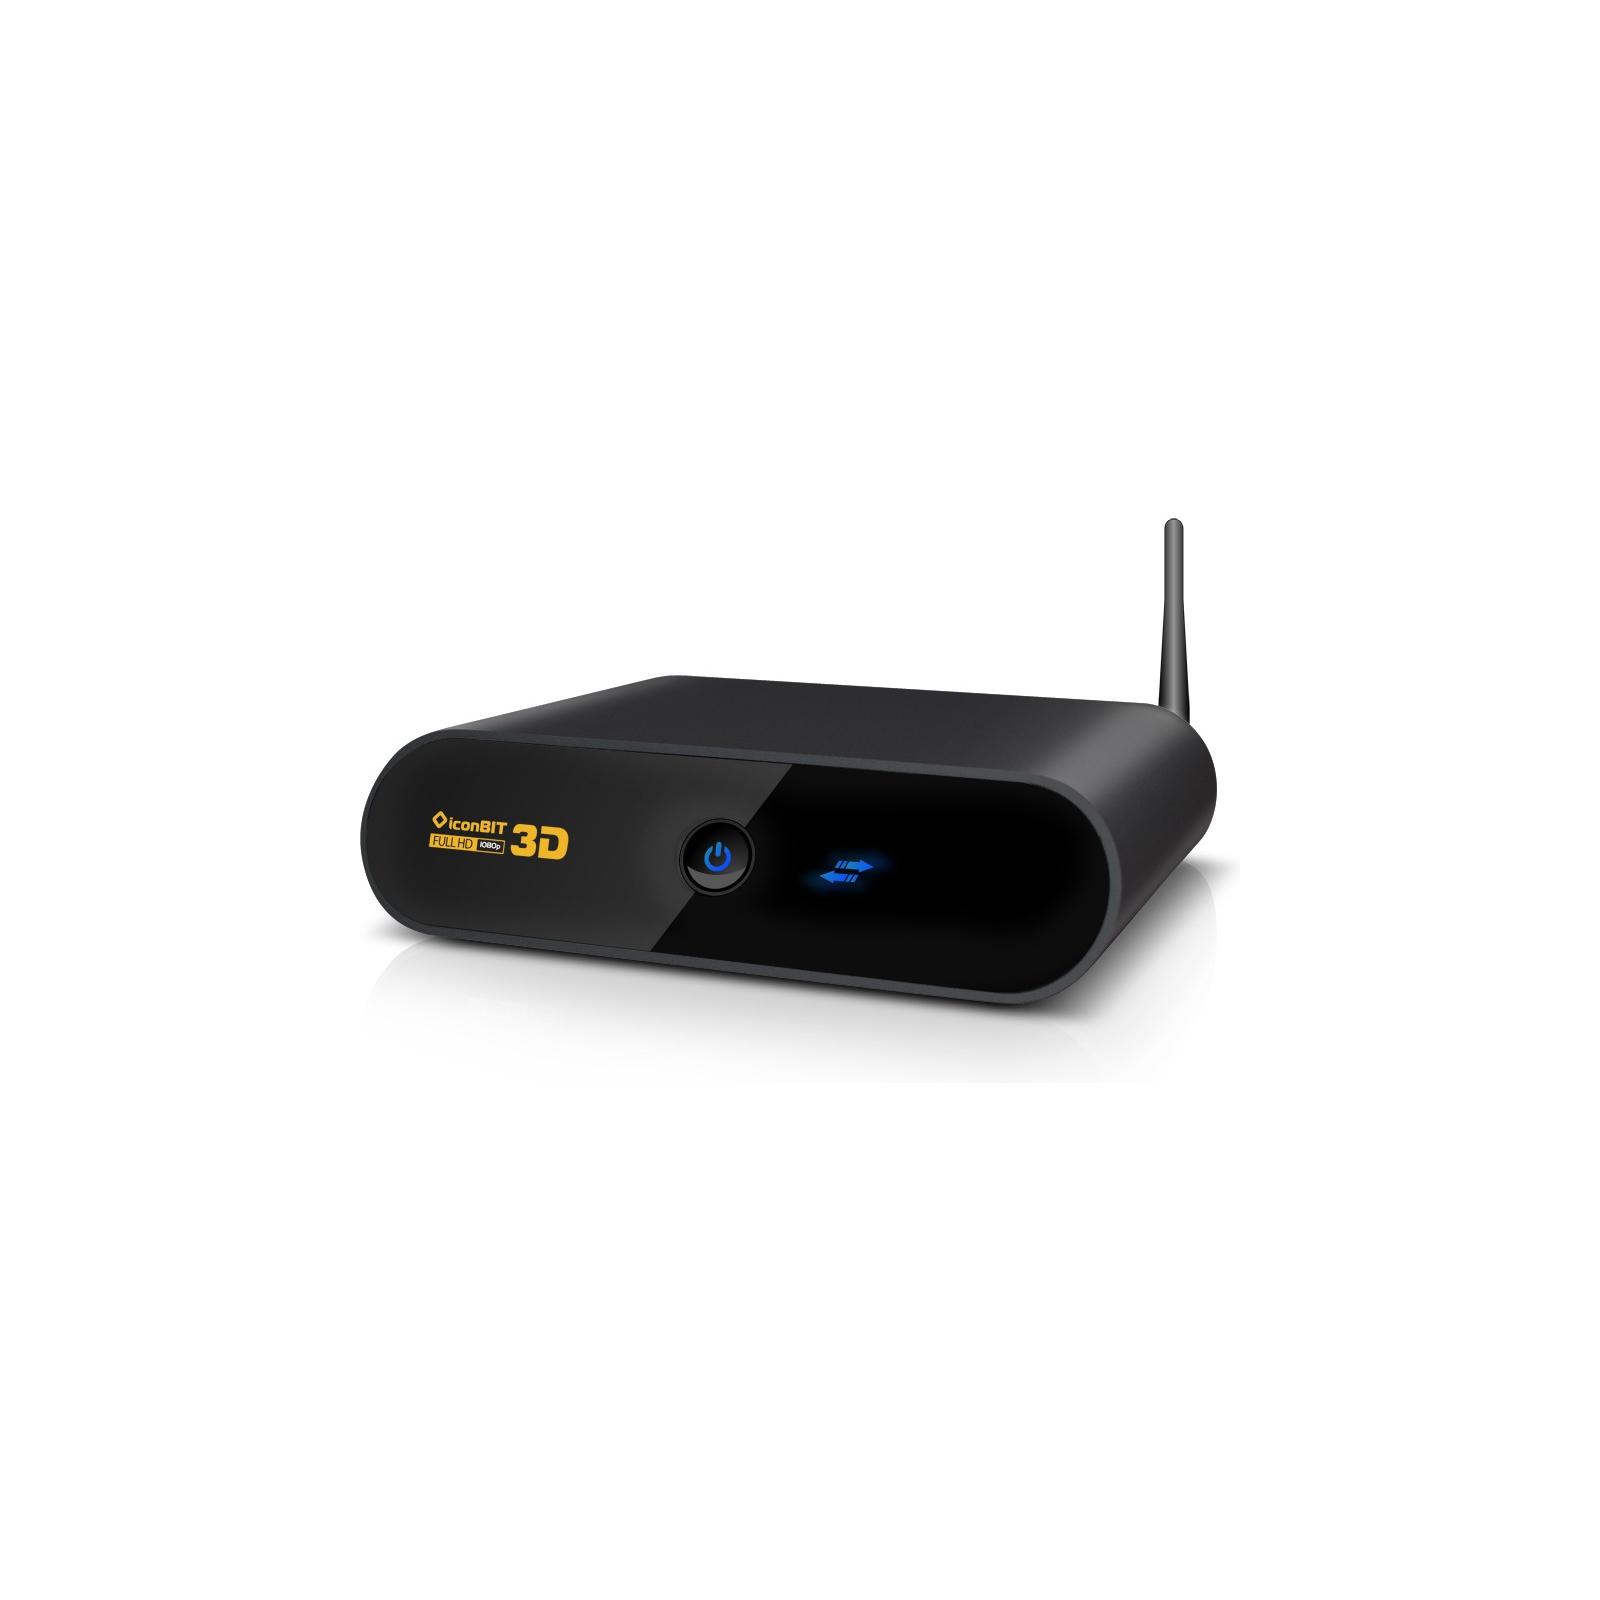 Медиаплеер iconBIT XDS 7 3D mk2 (MD-0008W)